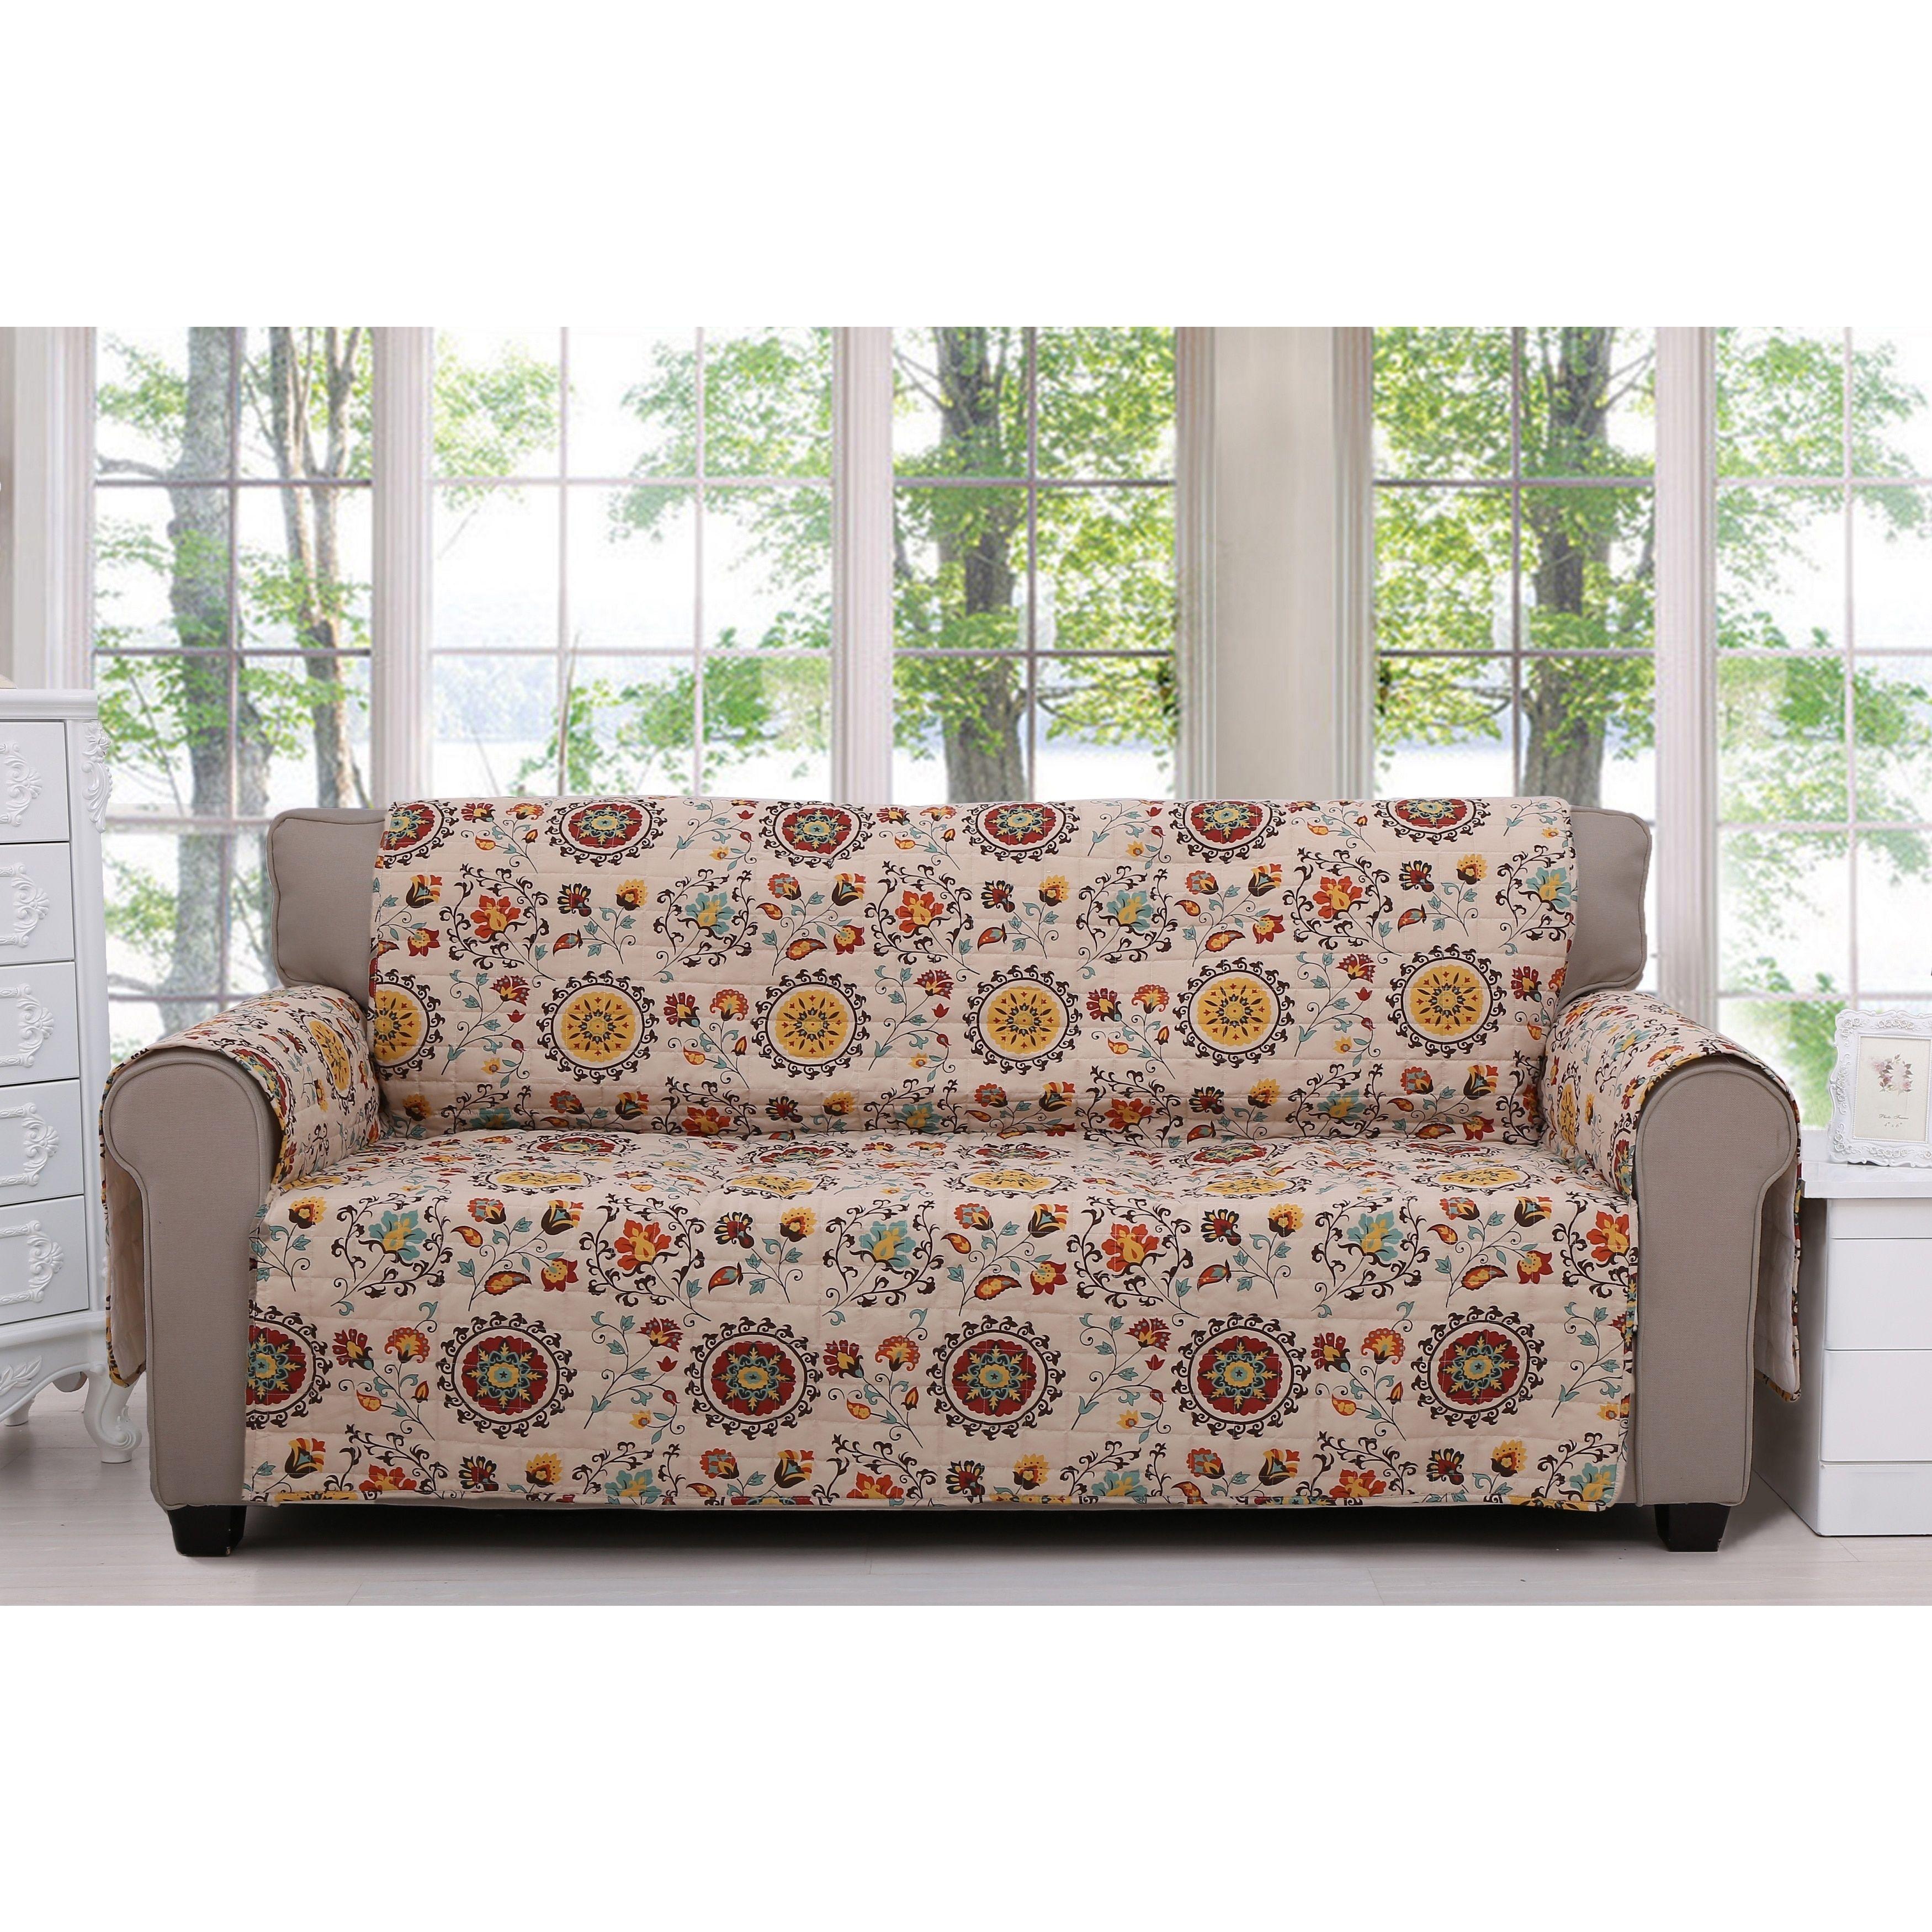 Greenland home fashions andorra furniture sofa protector andorra furniture protector sofa multi design